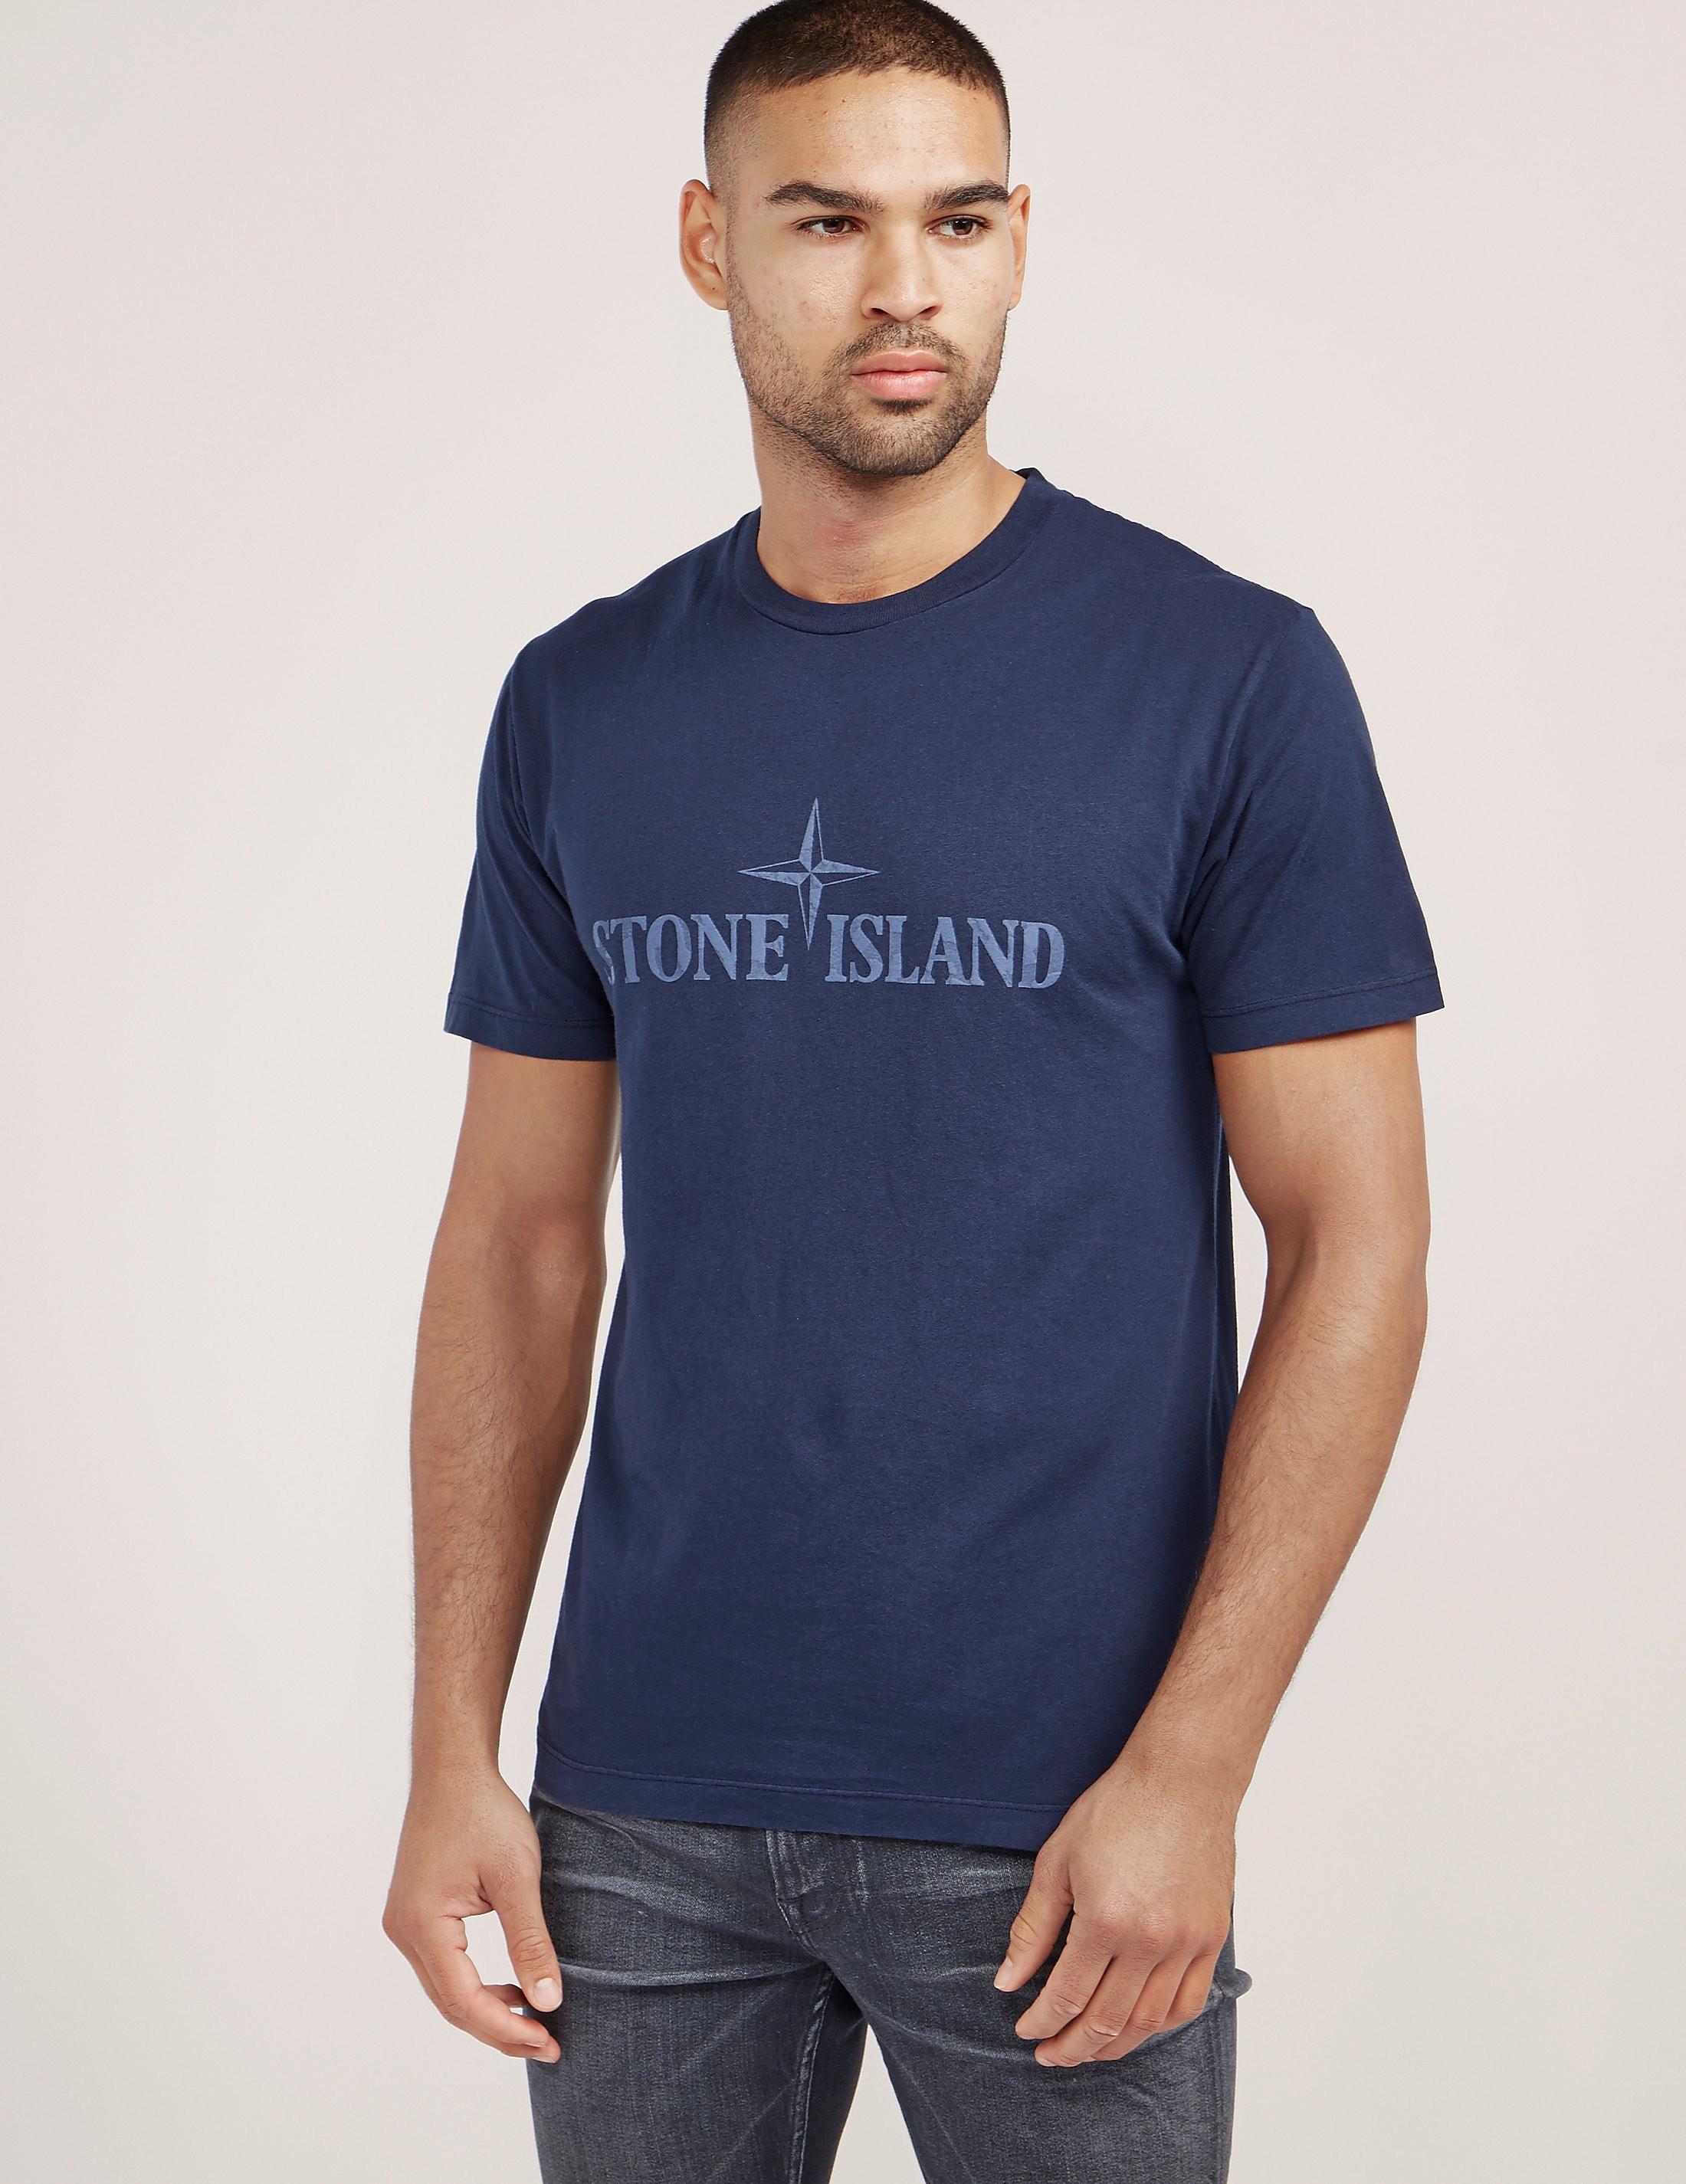 Stone Island Logo Short Sleeve T-Shirt